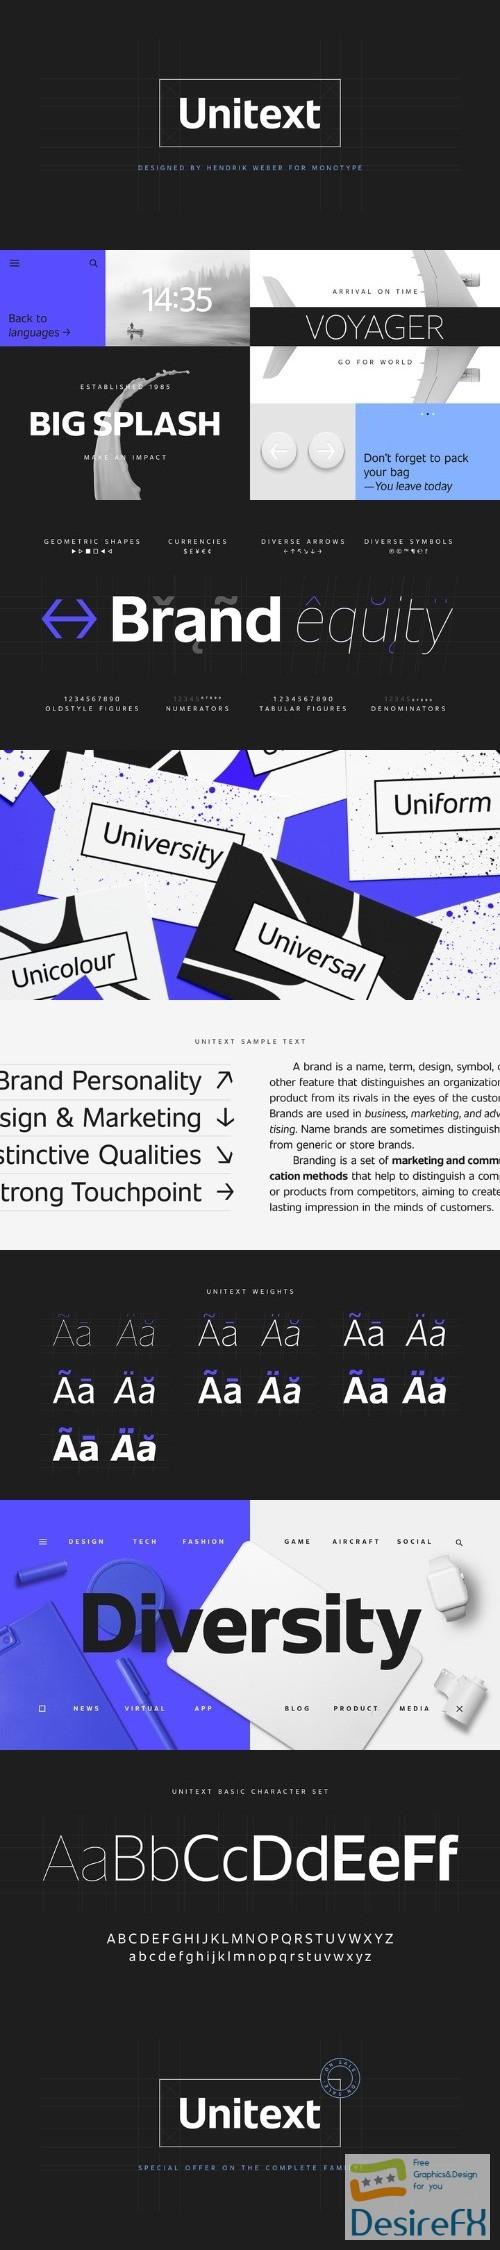 Desirefx com | Download Unitext font family